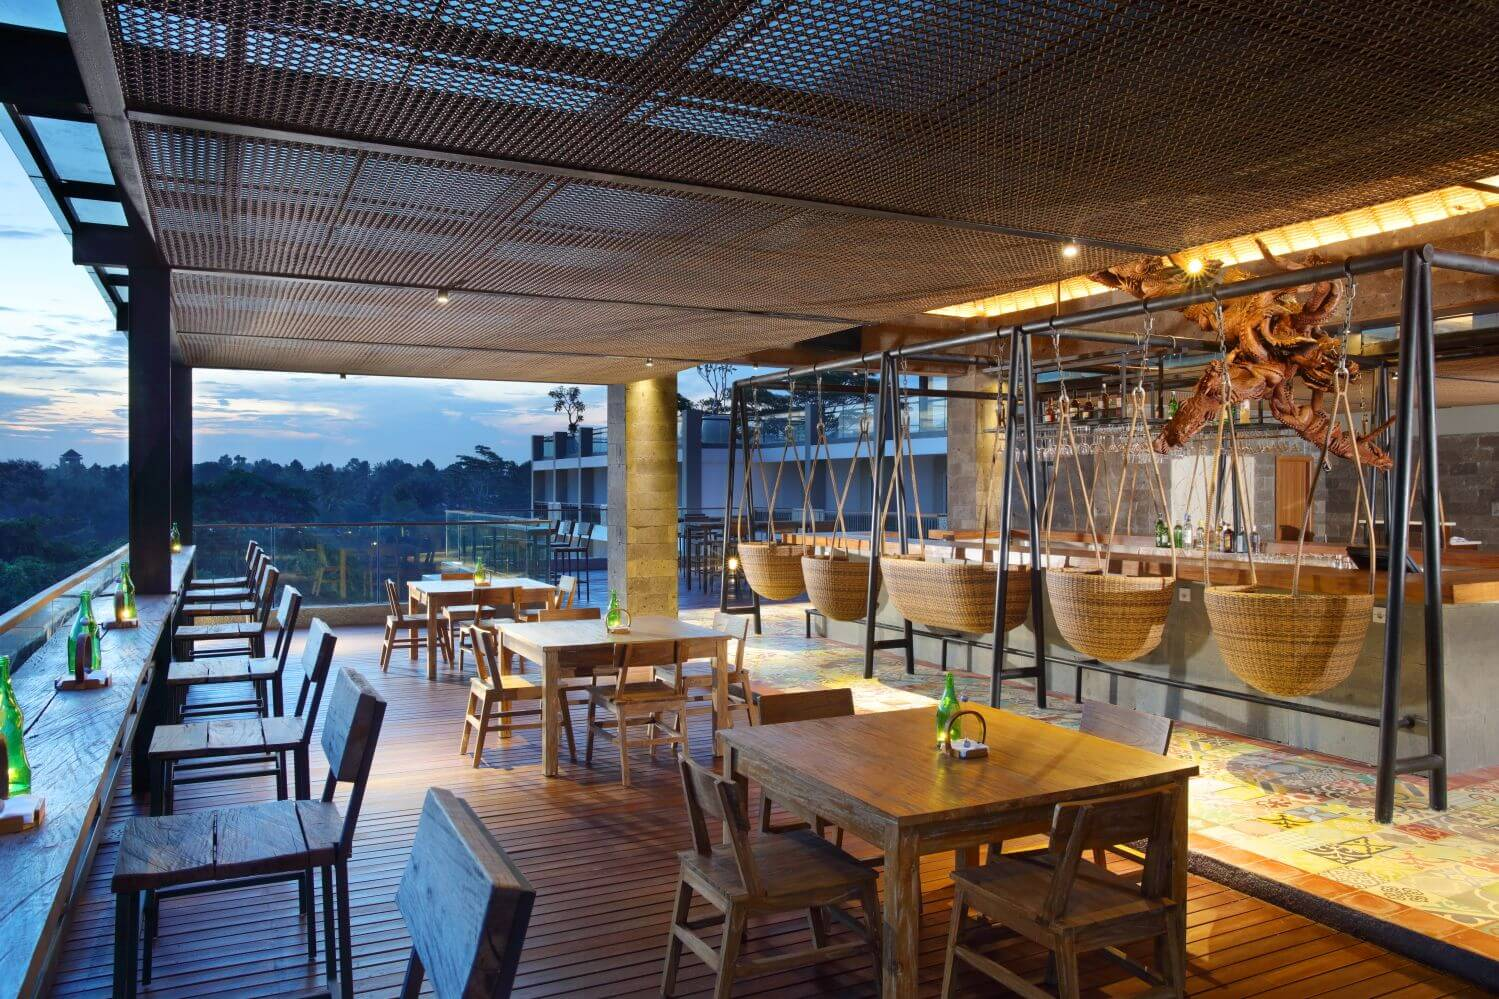 Naga Rooftop Bar